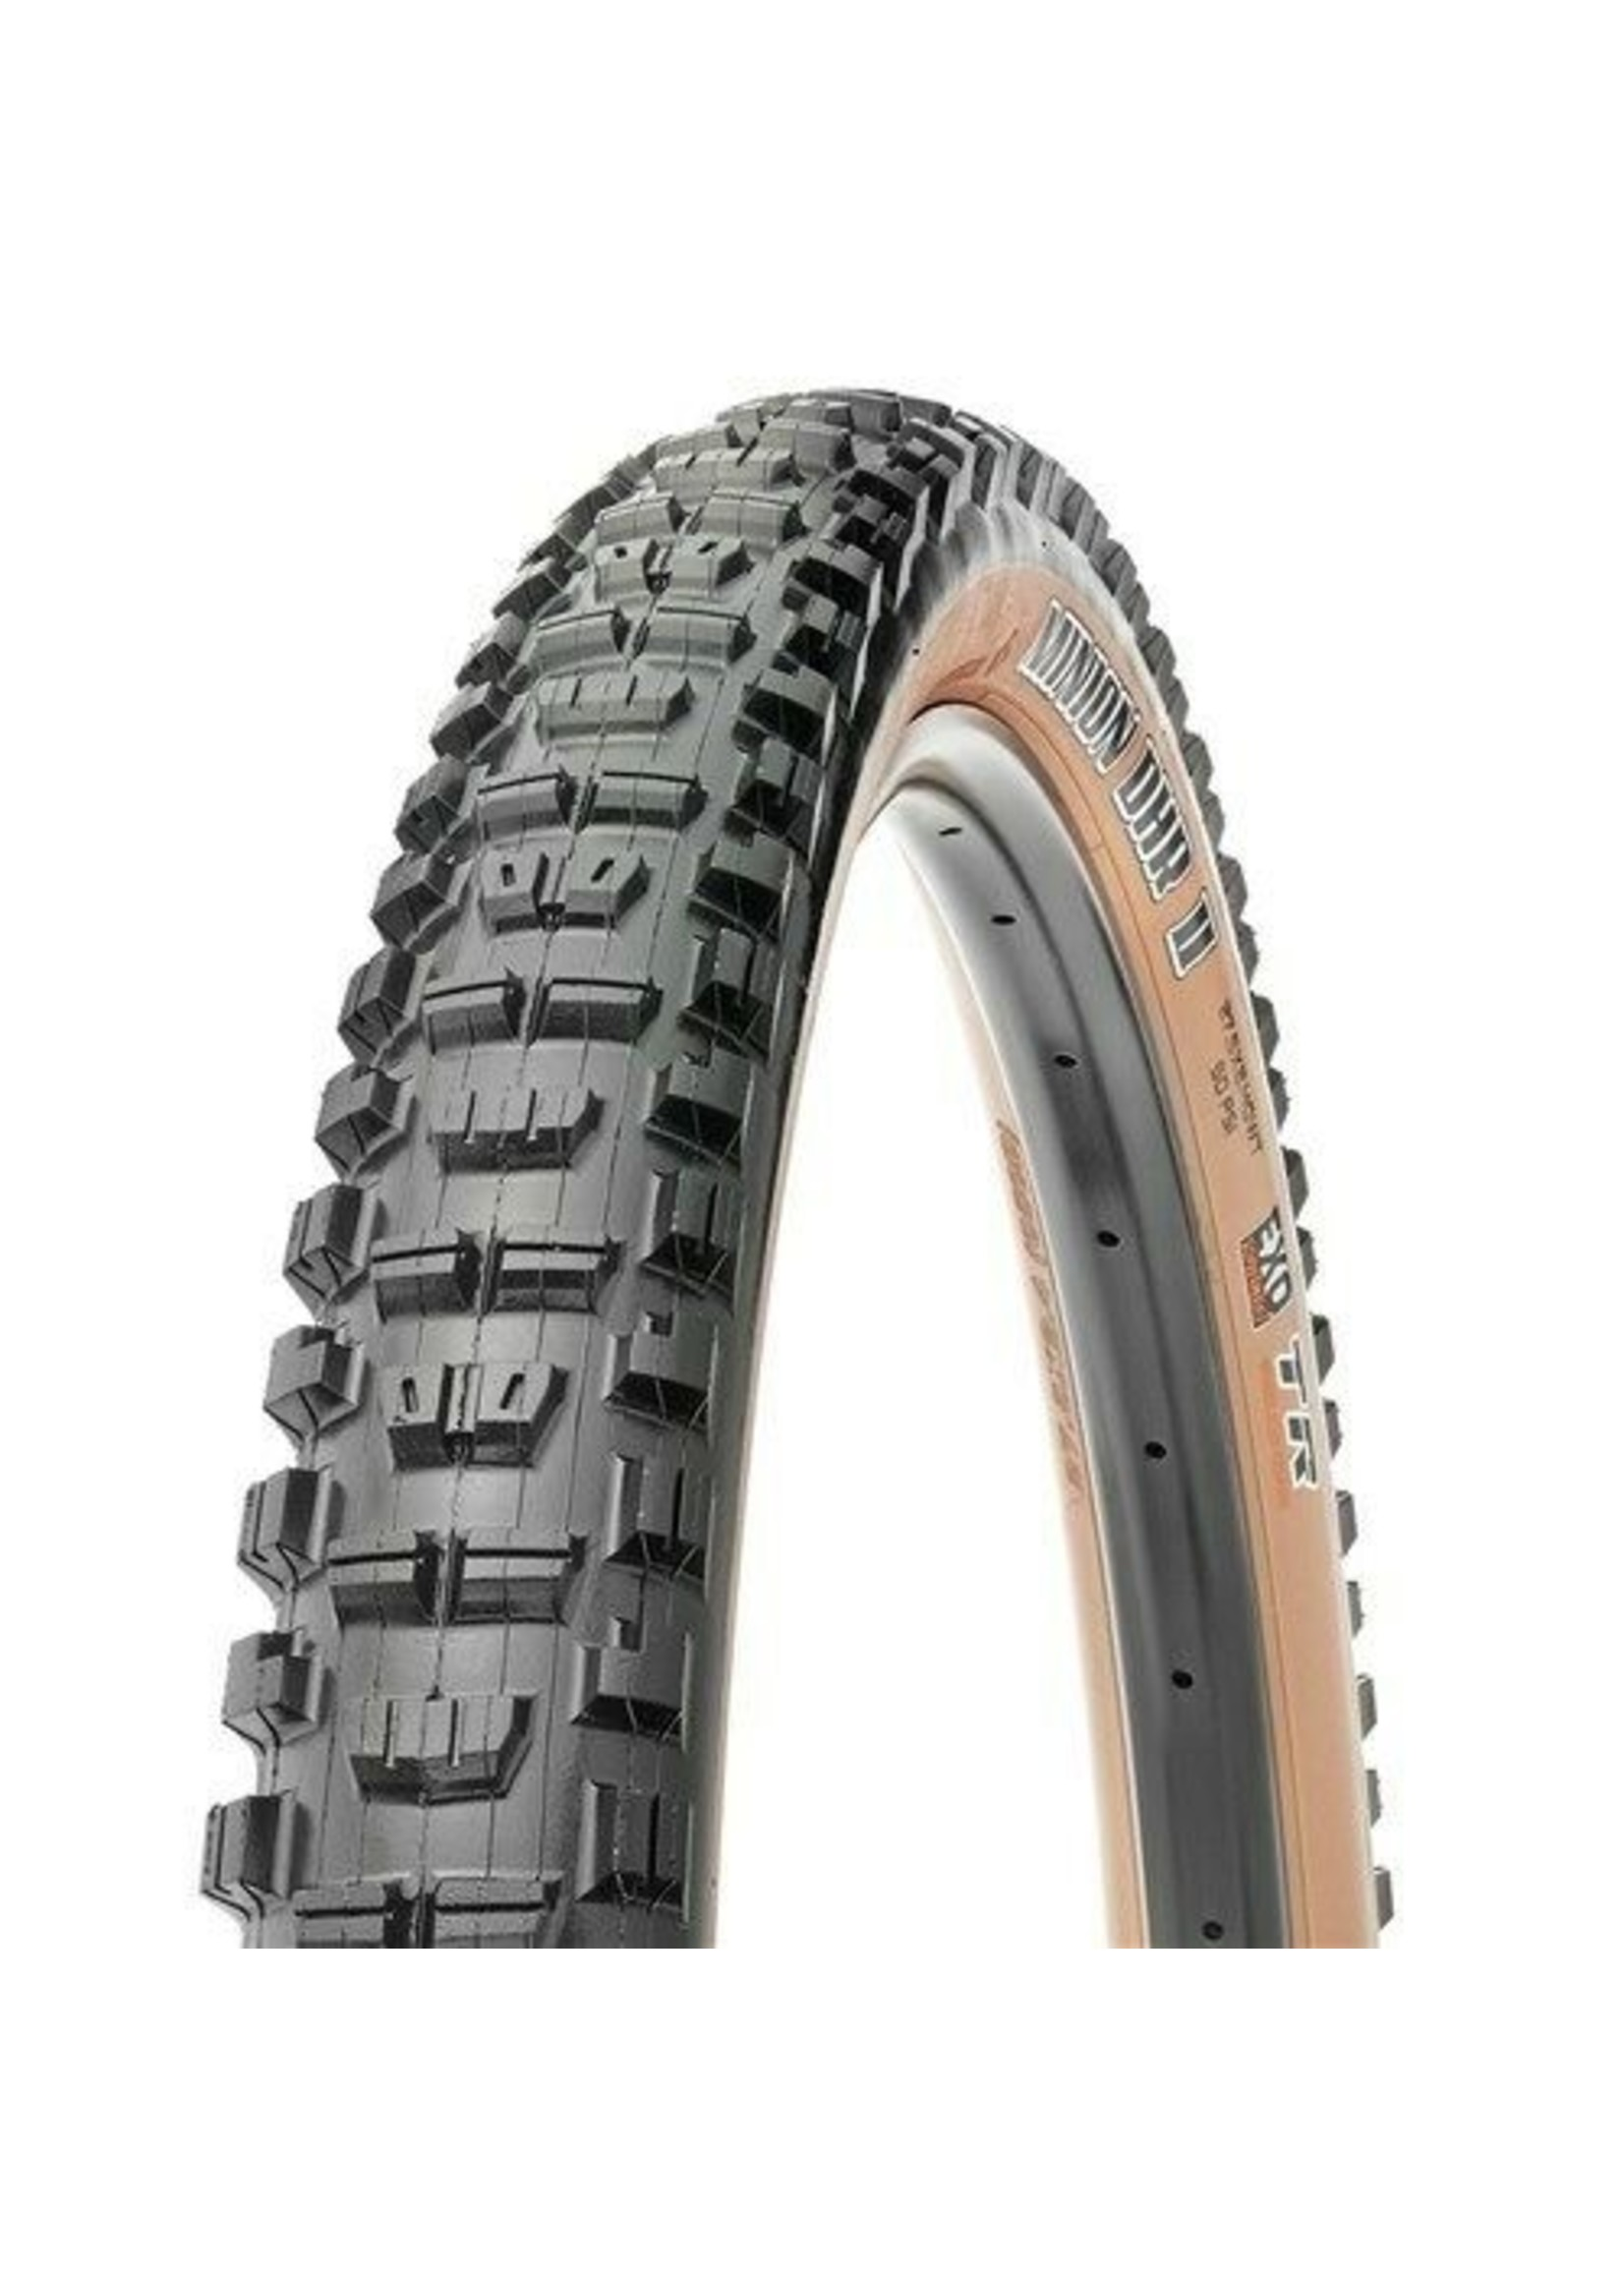 Maxxis Maxxis, Minion DHR2, Tire, 27.5''x2.40, Folding, Tubeless Ready, Dual, EXO, Wide Trail, 60TPI, Tanwall